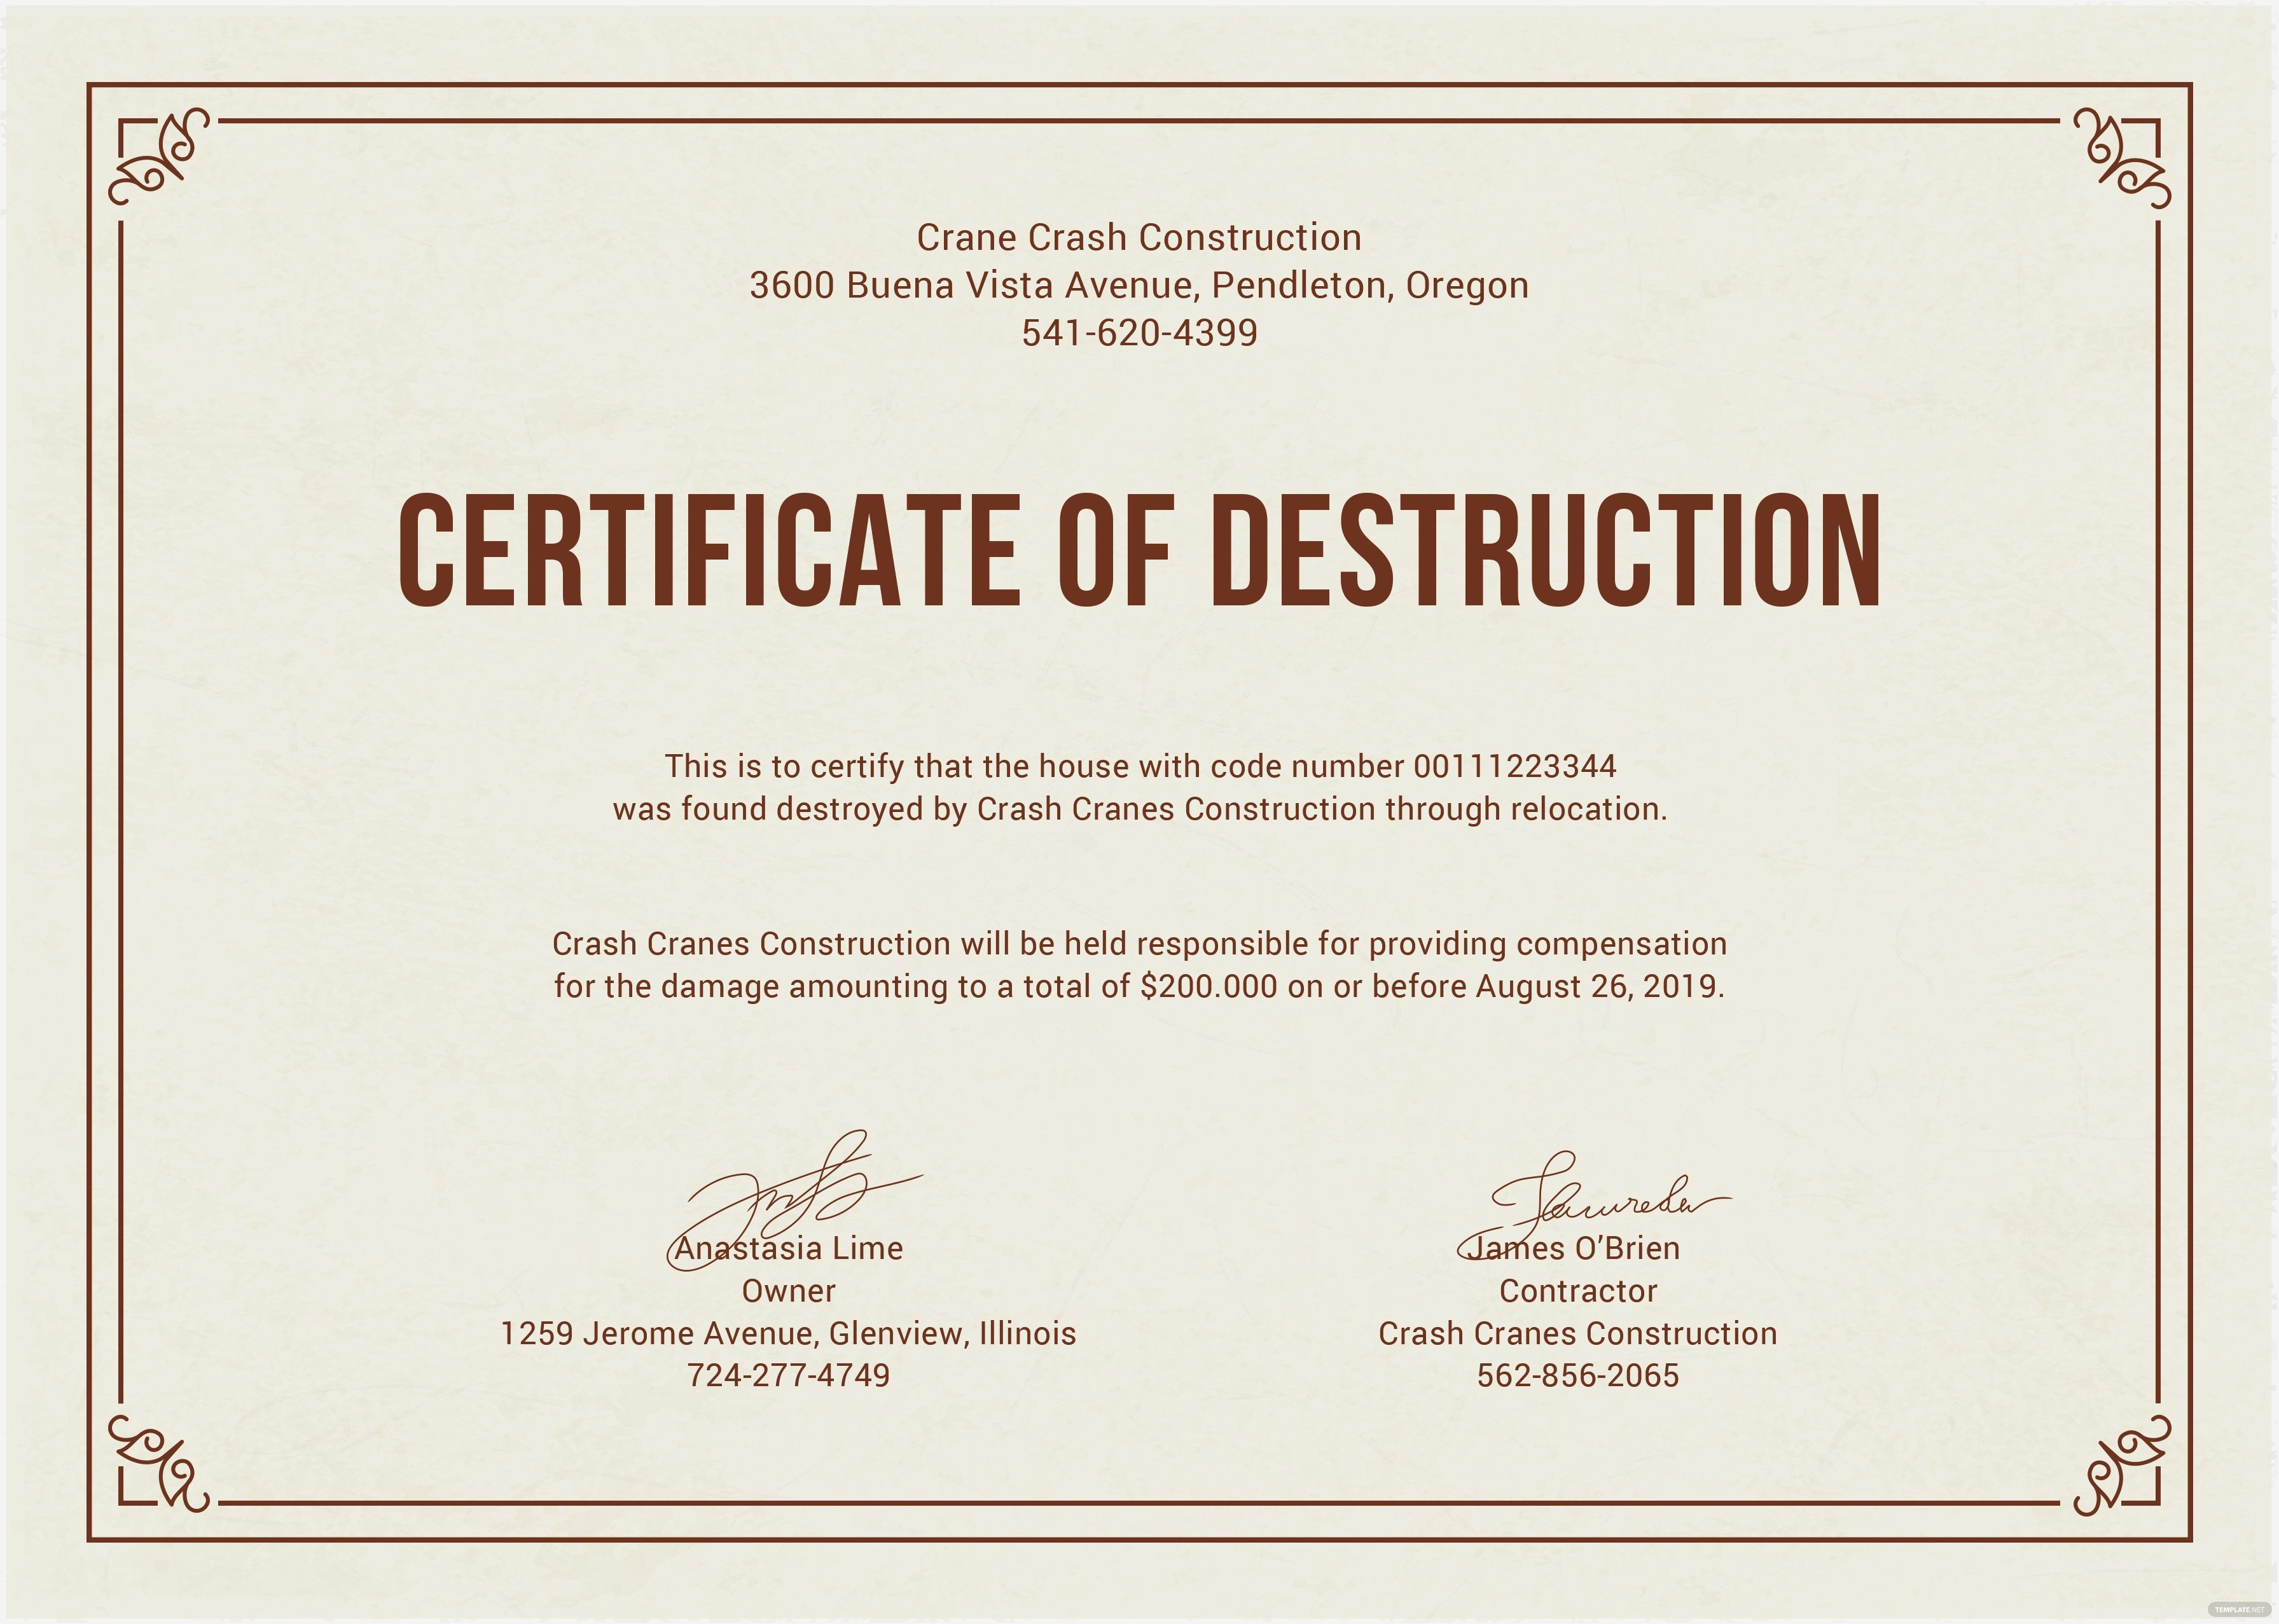 Certificate Of Destruction Template Free Certificate Of Destruction Template In Adobe